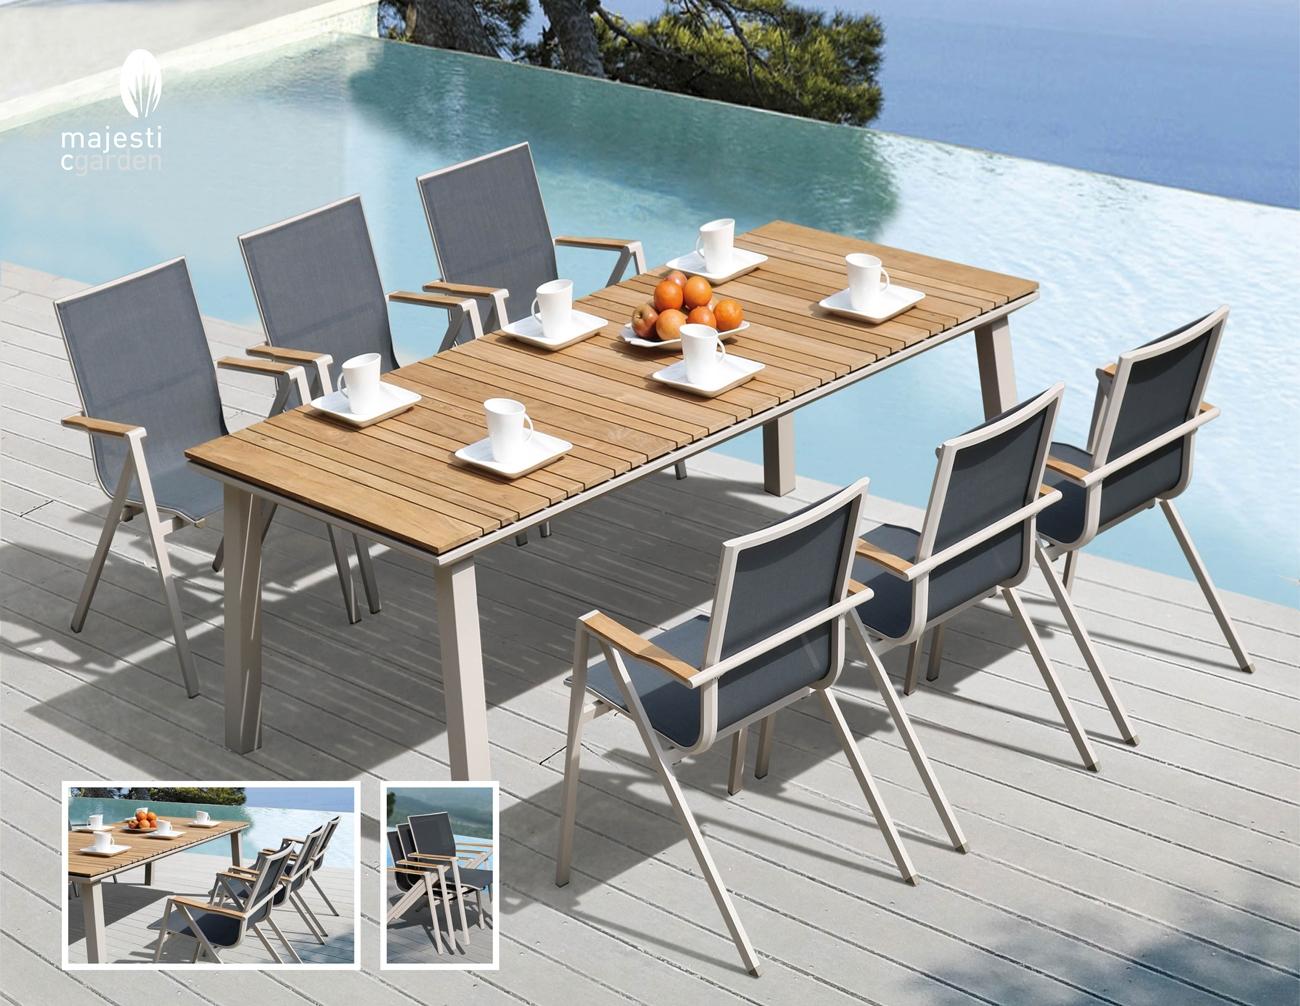 COMEDOR PARA EXTERIOR BOLIVIA - Juego de mesa y sillas para exterior modelo SIDNEY de Majestic Garden